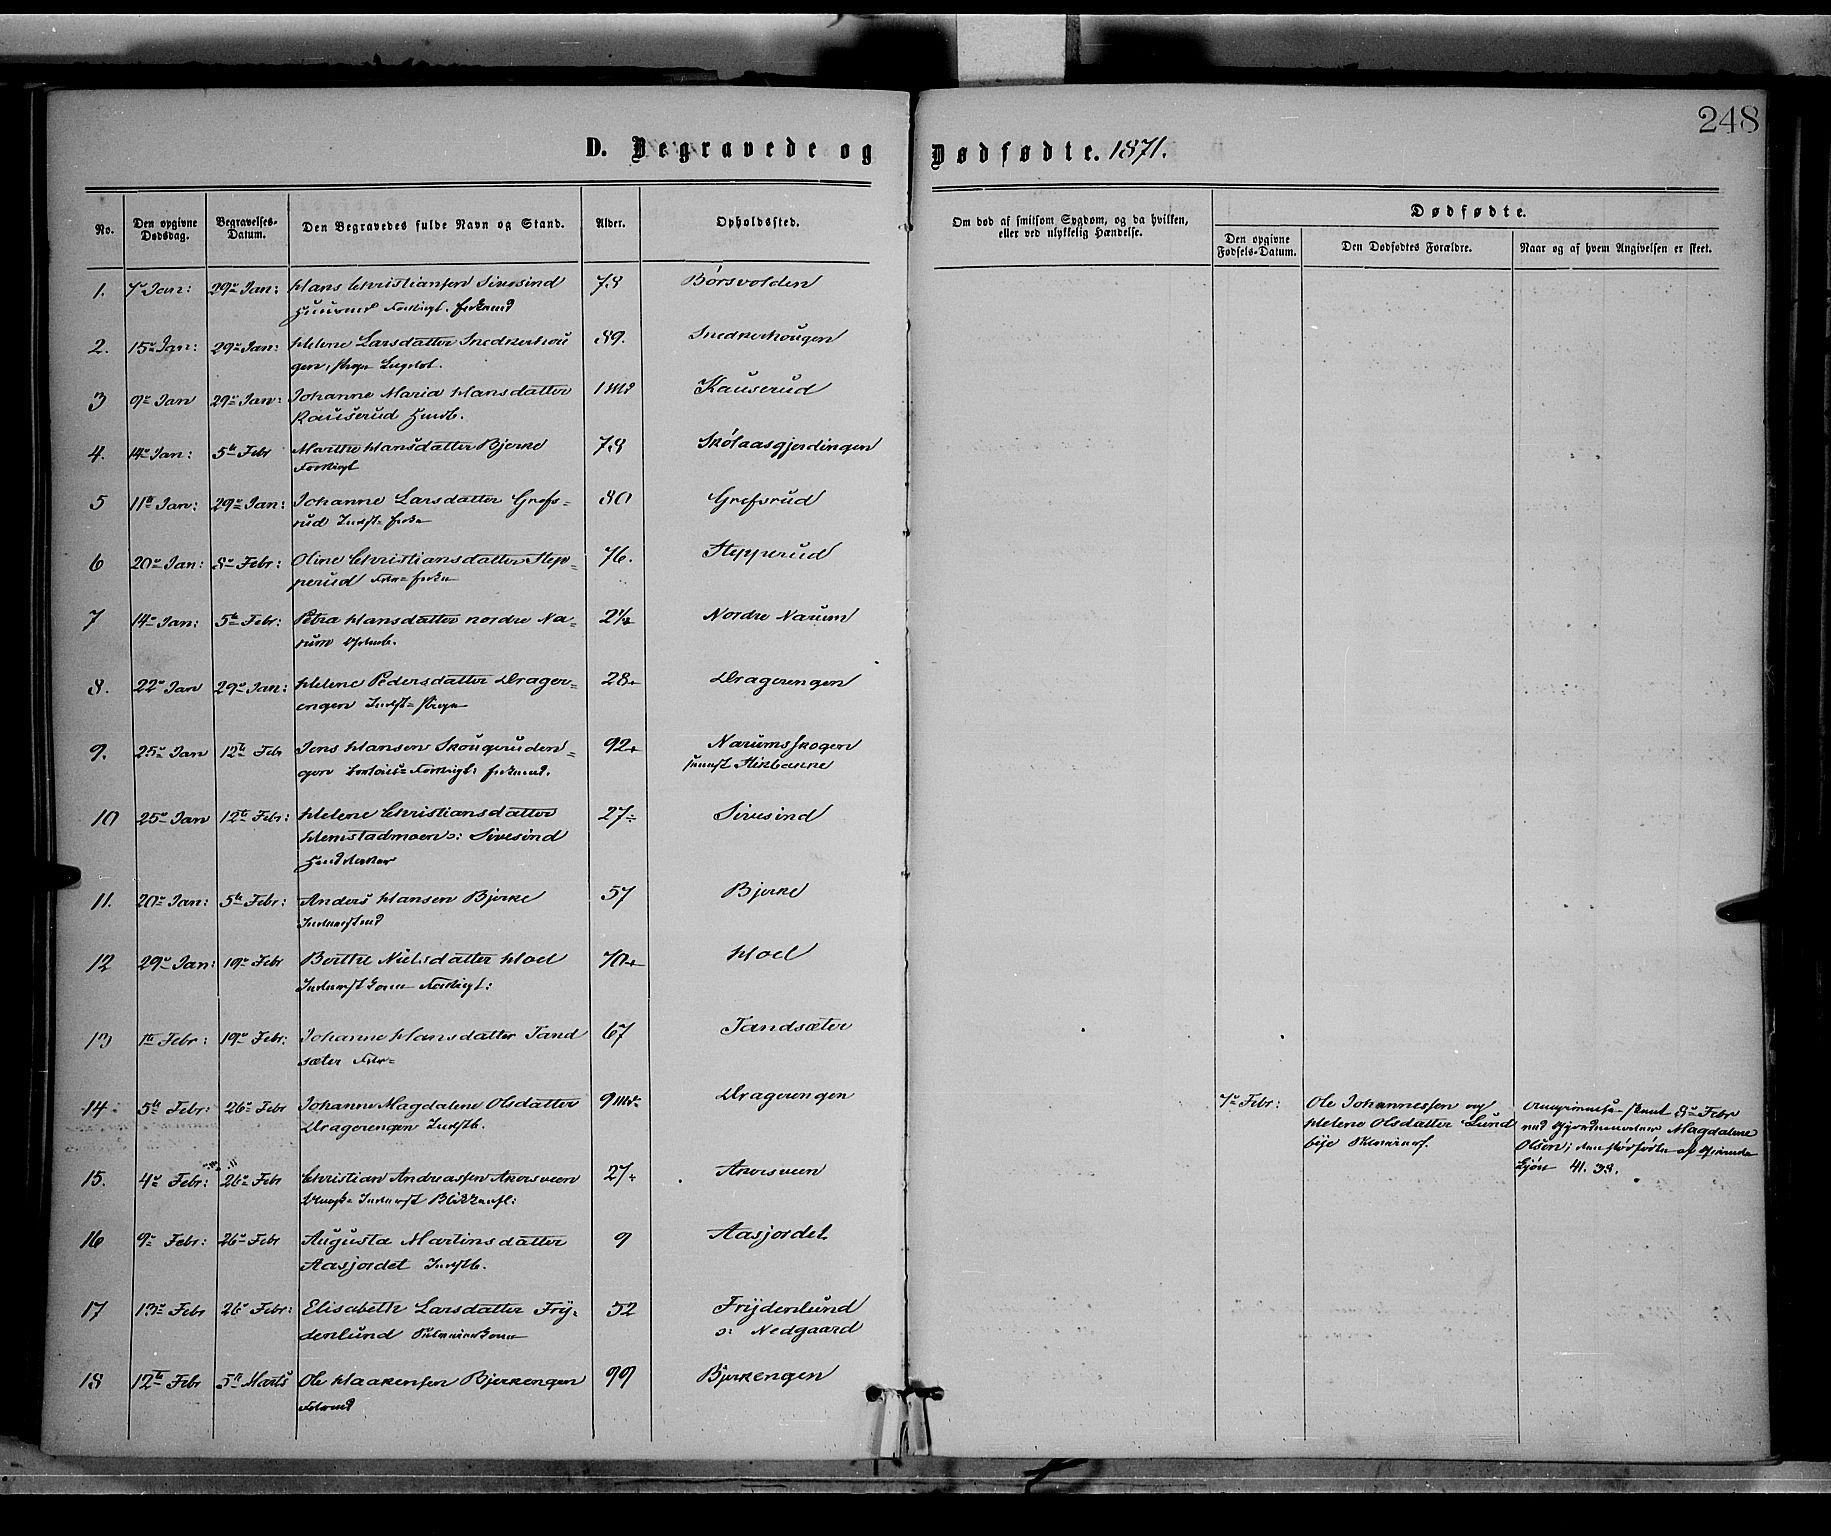 SAH, Vestre Toten prestekontor, H/Ha/Haa/L0008: Ministerialbok nr. 8, 1870-1877, s. 248